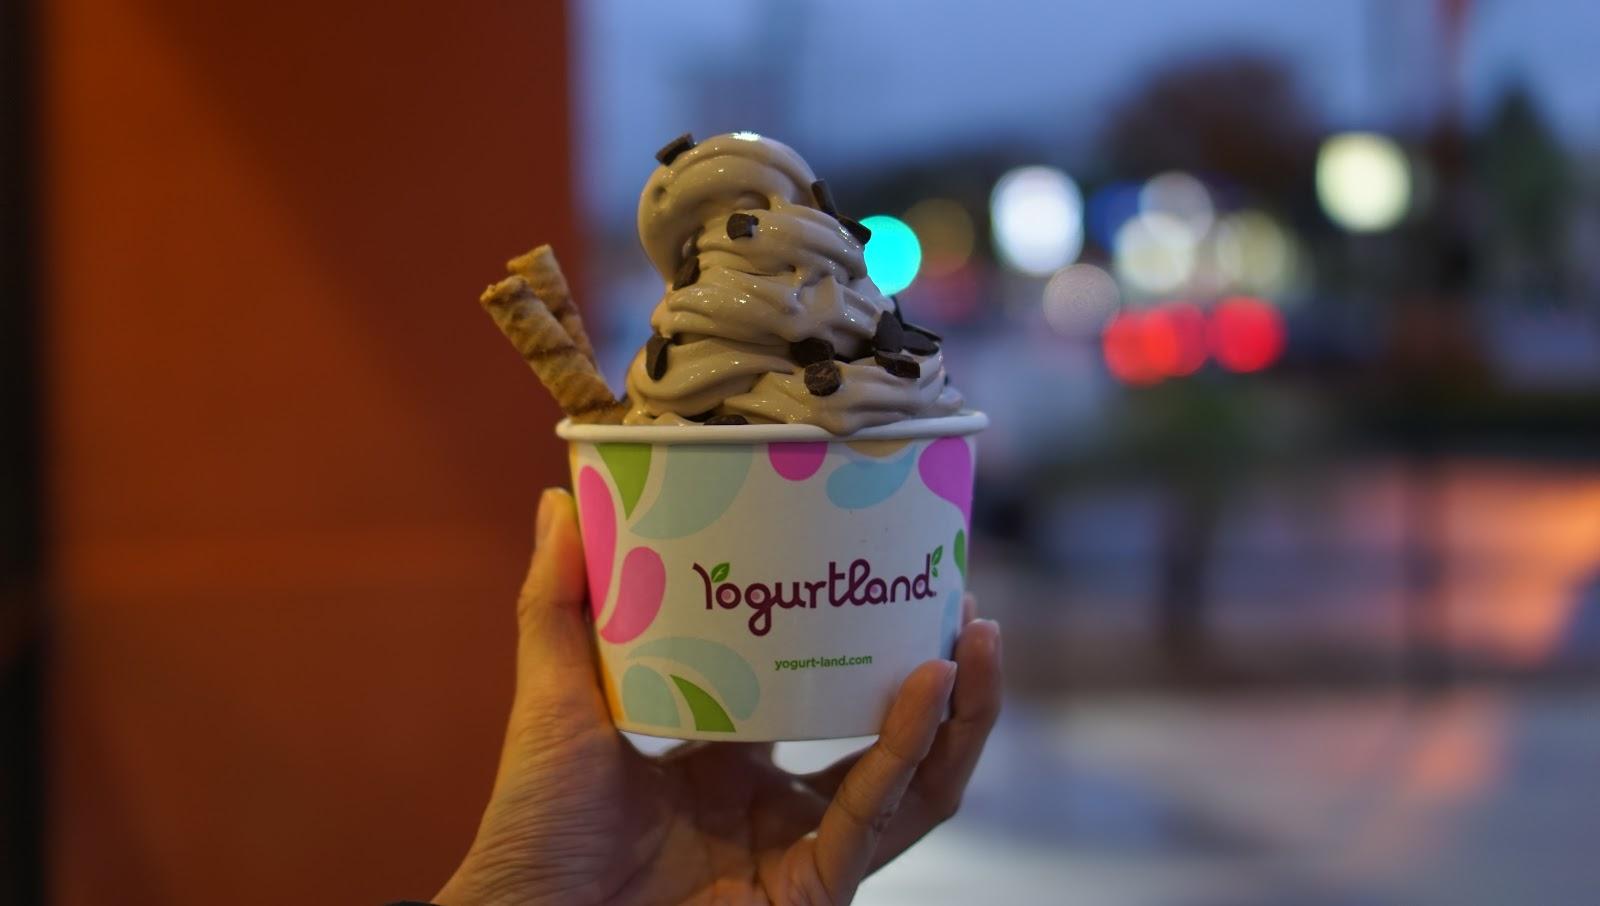 The Yogurtland Oreo Ice Cream Is My New FAVE!